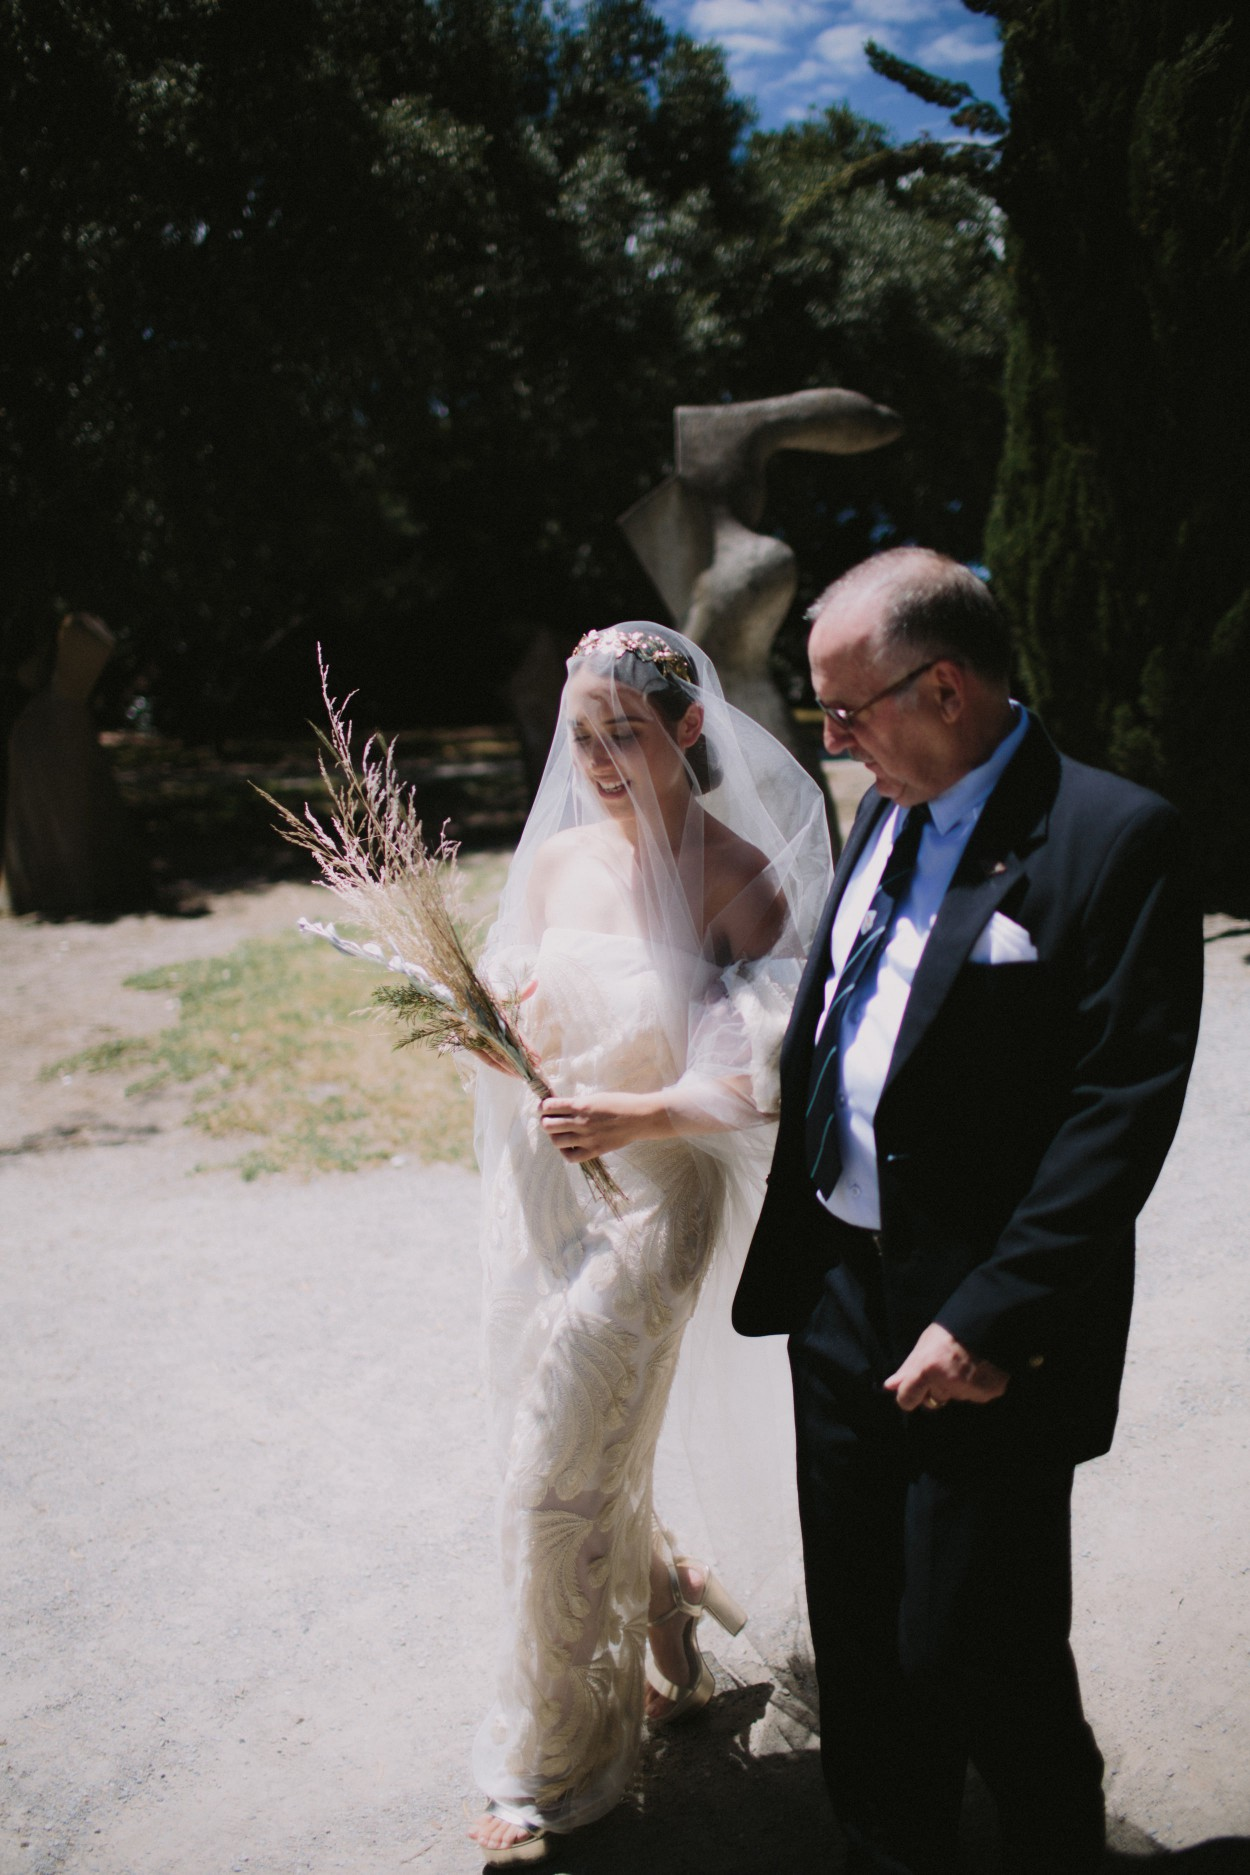 I-Got-You-Babe-Weddings-Heide-Museum-of-Modern-Art-Elopement-Susie-Nathan005.jpg